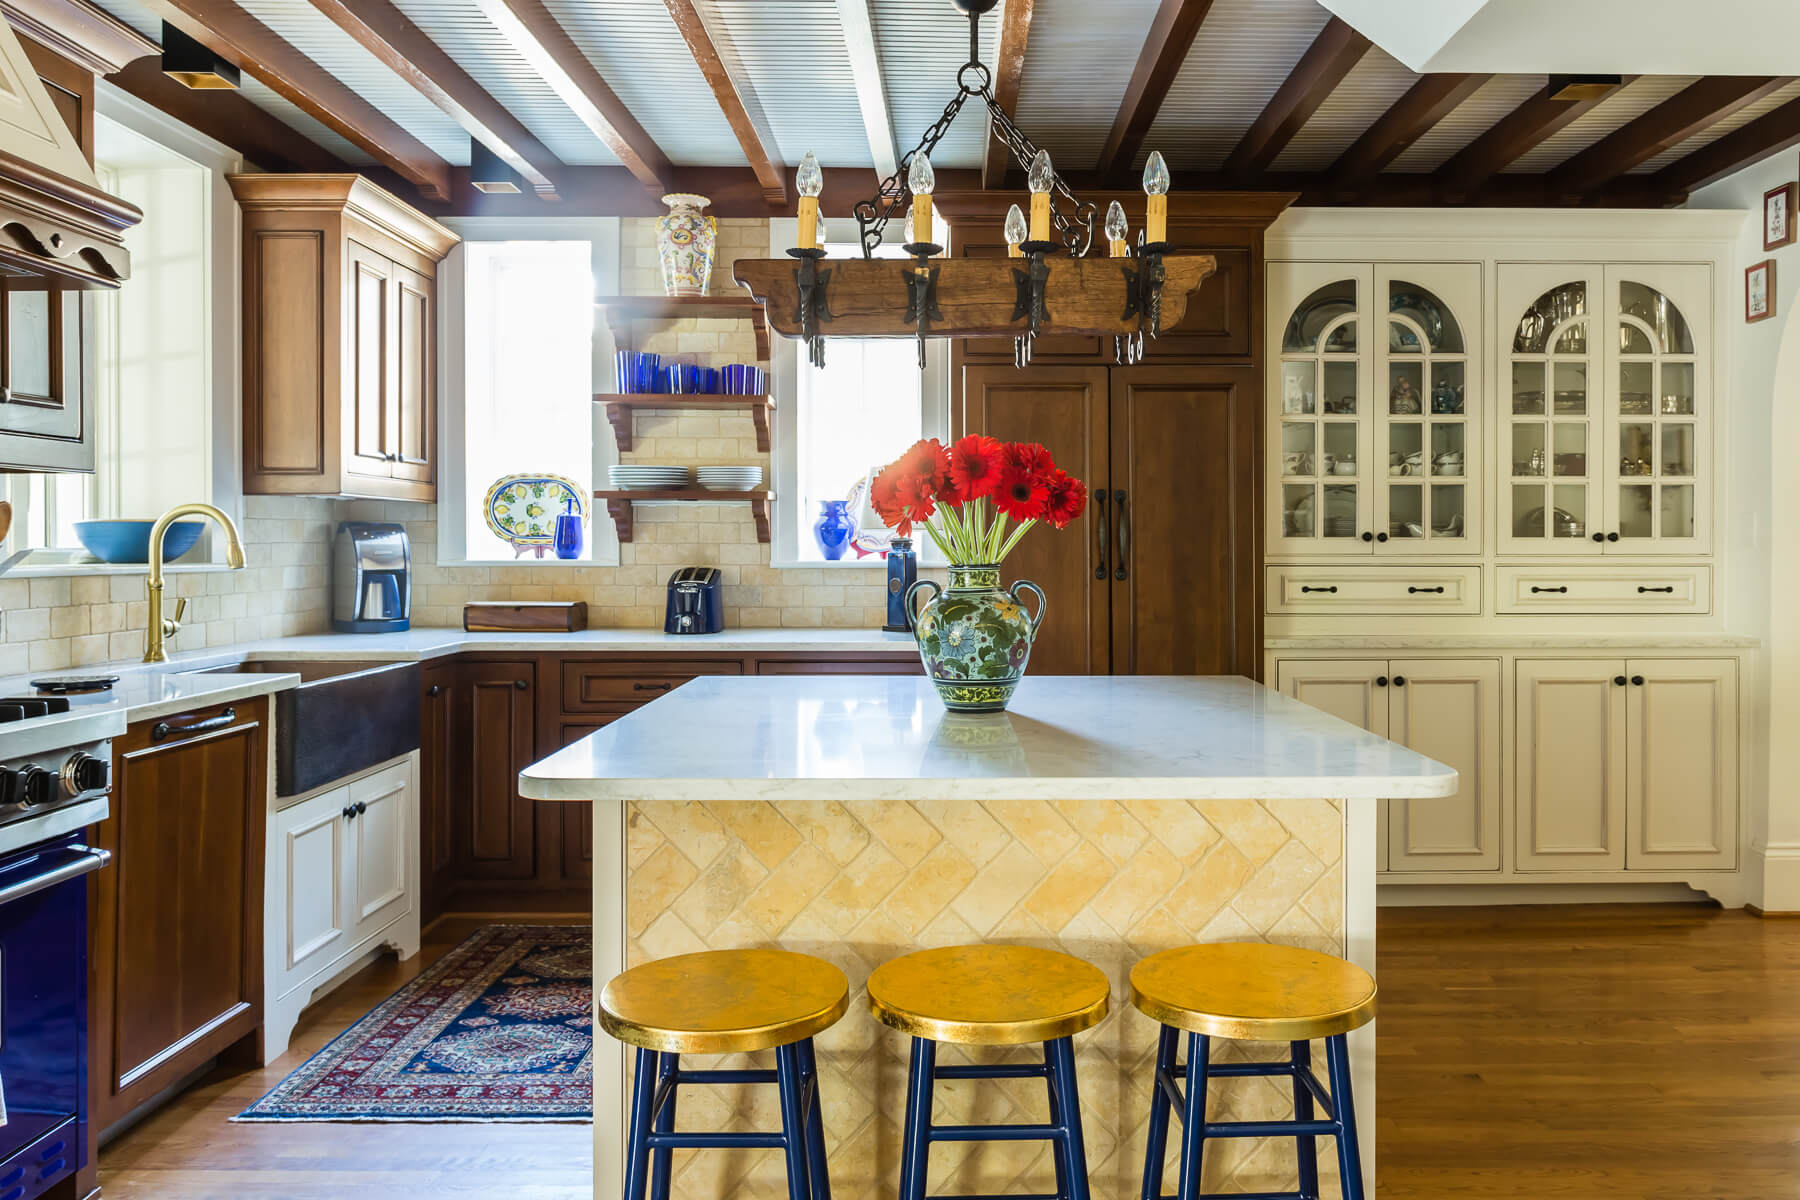 Spanish Kitchen Wood Painted Cabinets Floating Shelves